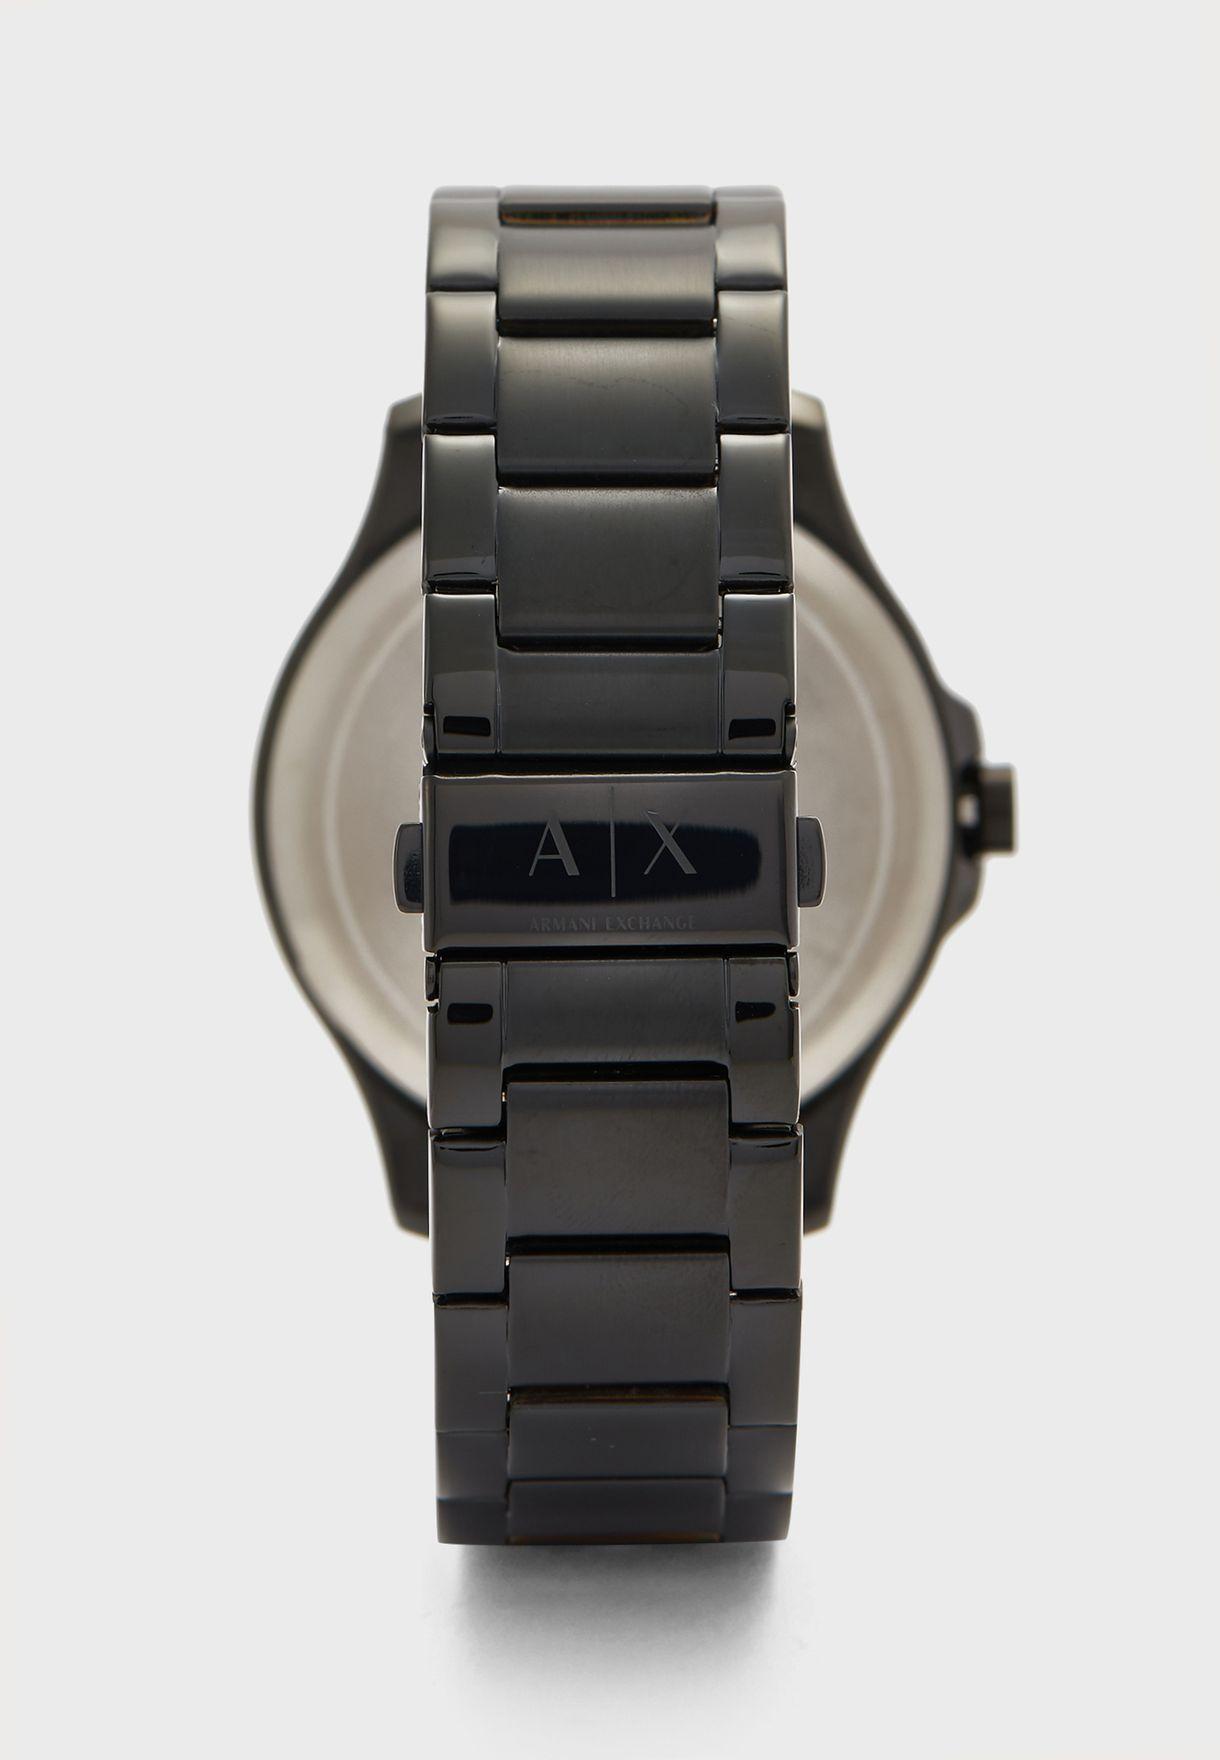 ساعة انالوج AX2413